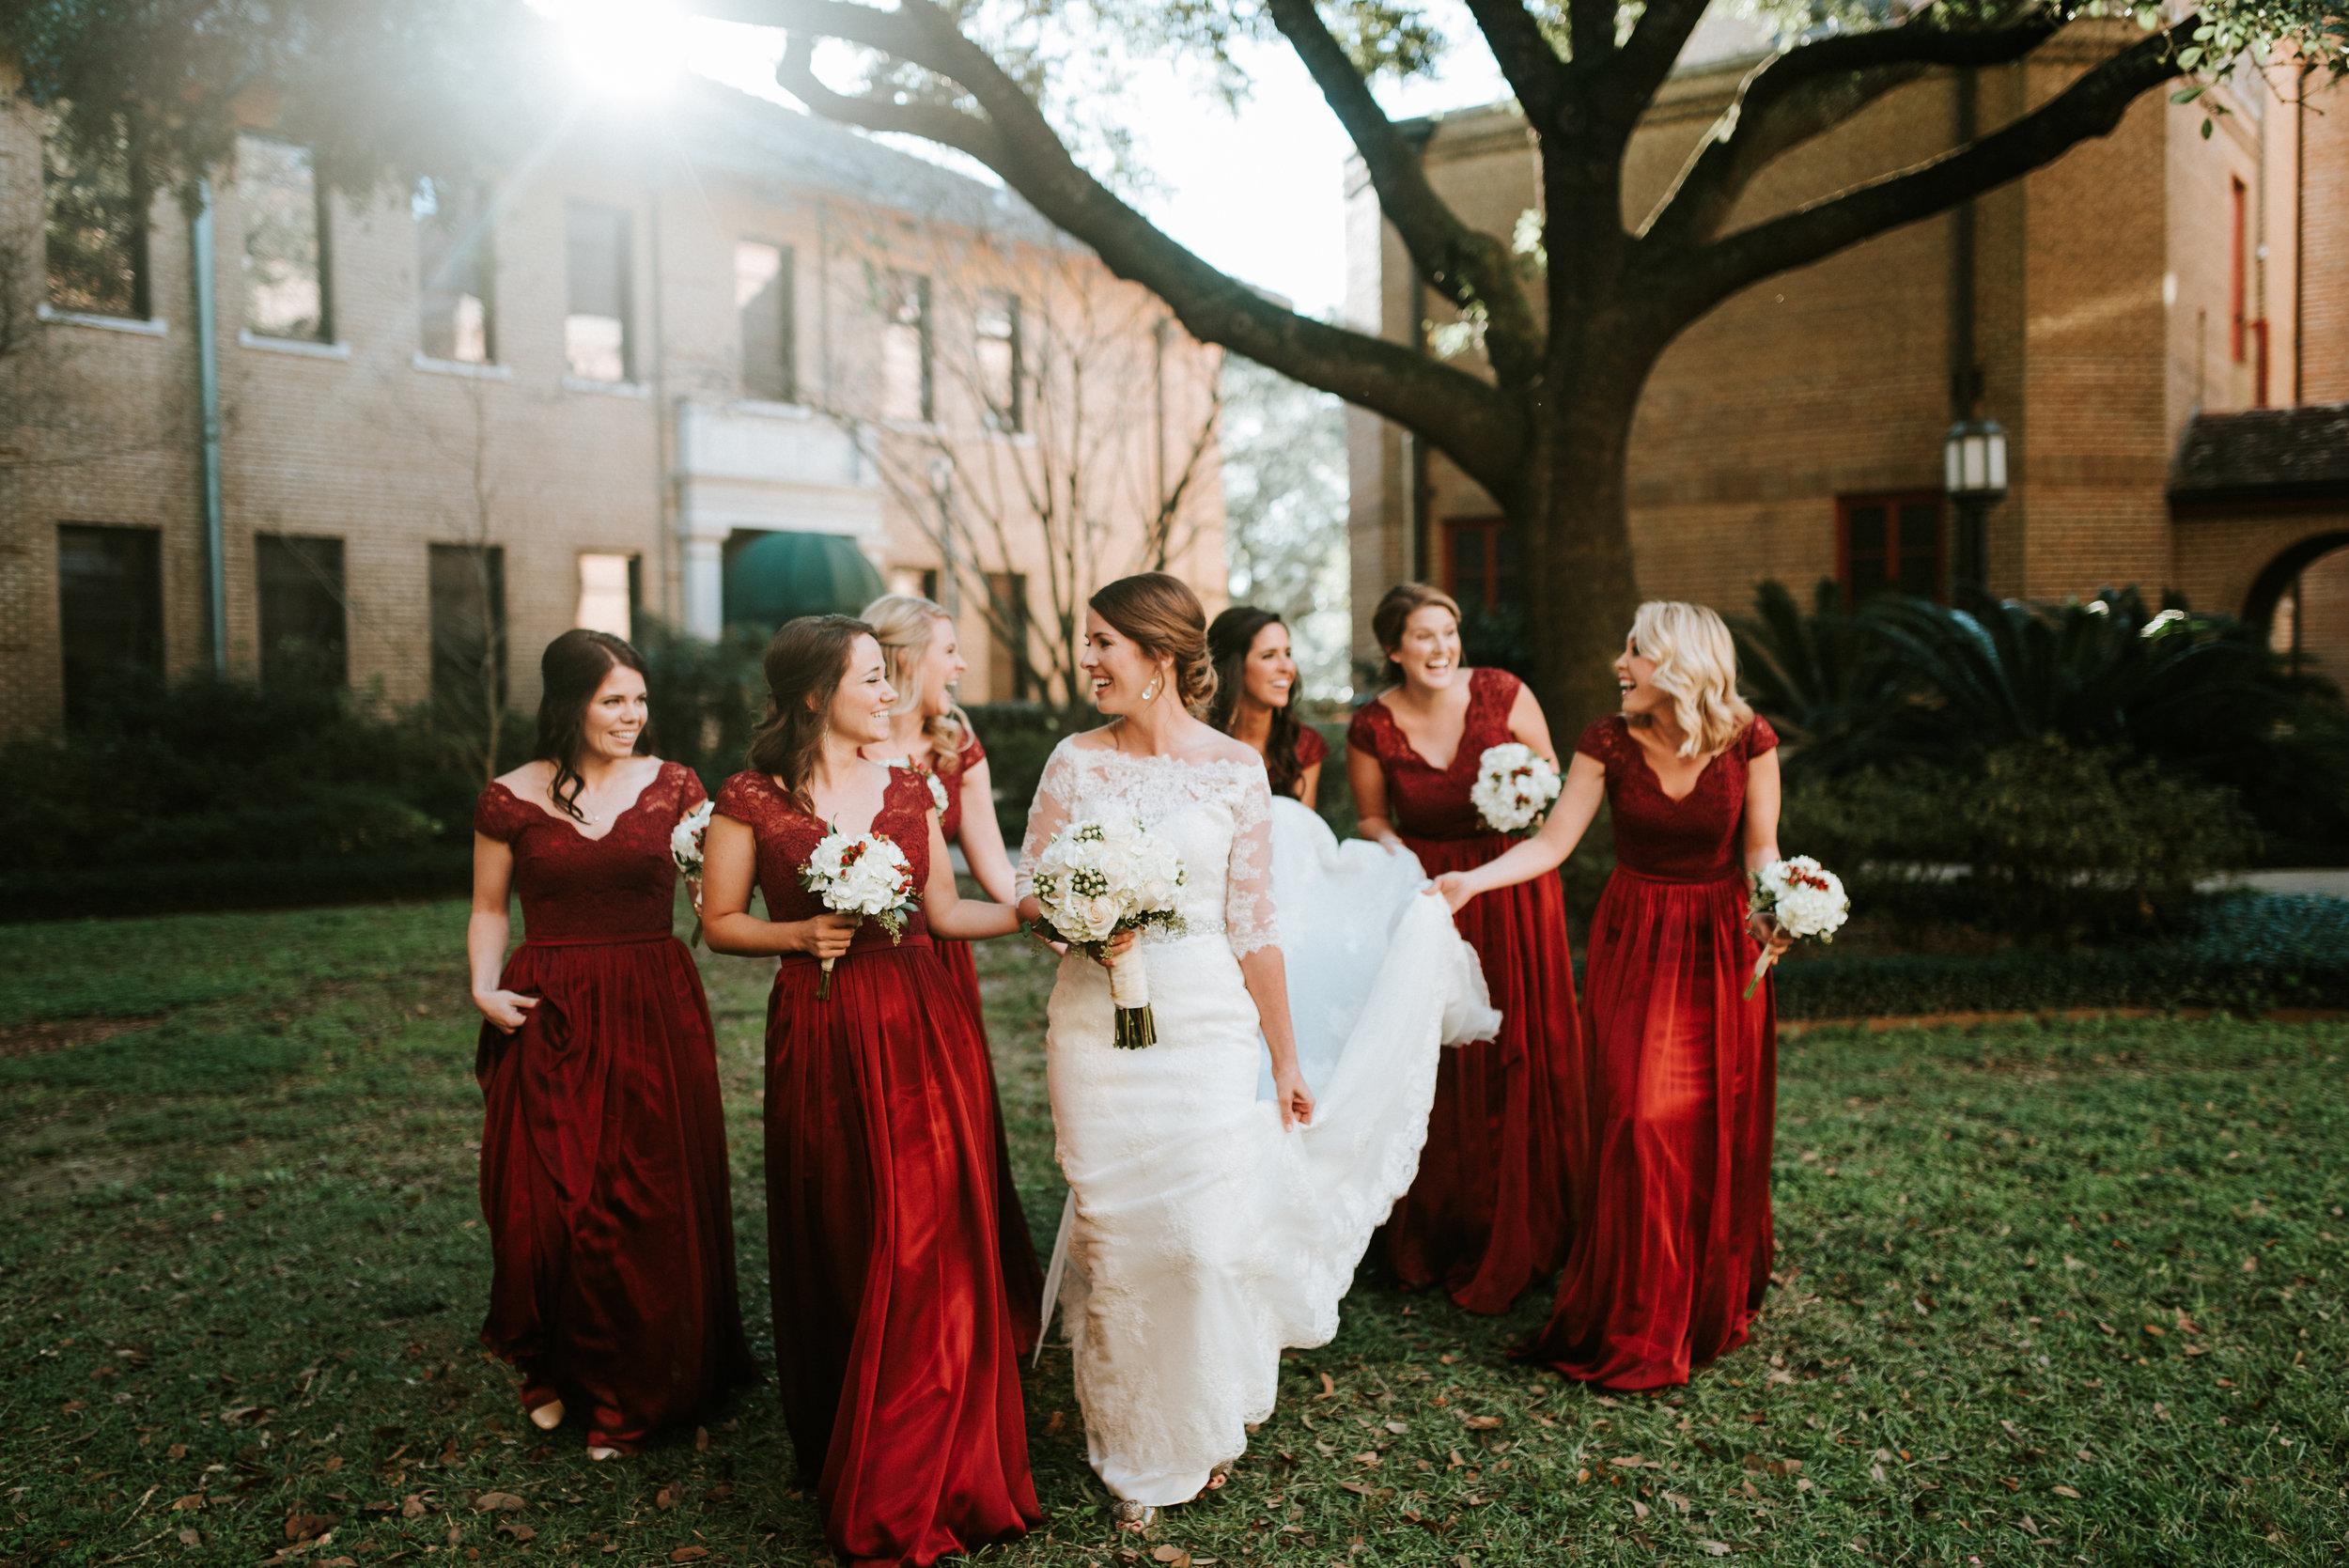 Southern Fete, Southern Wedding, Action Shot of Bridal Party, Hannah Mulligan Photography